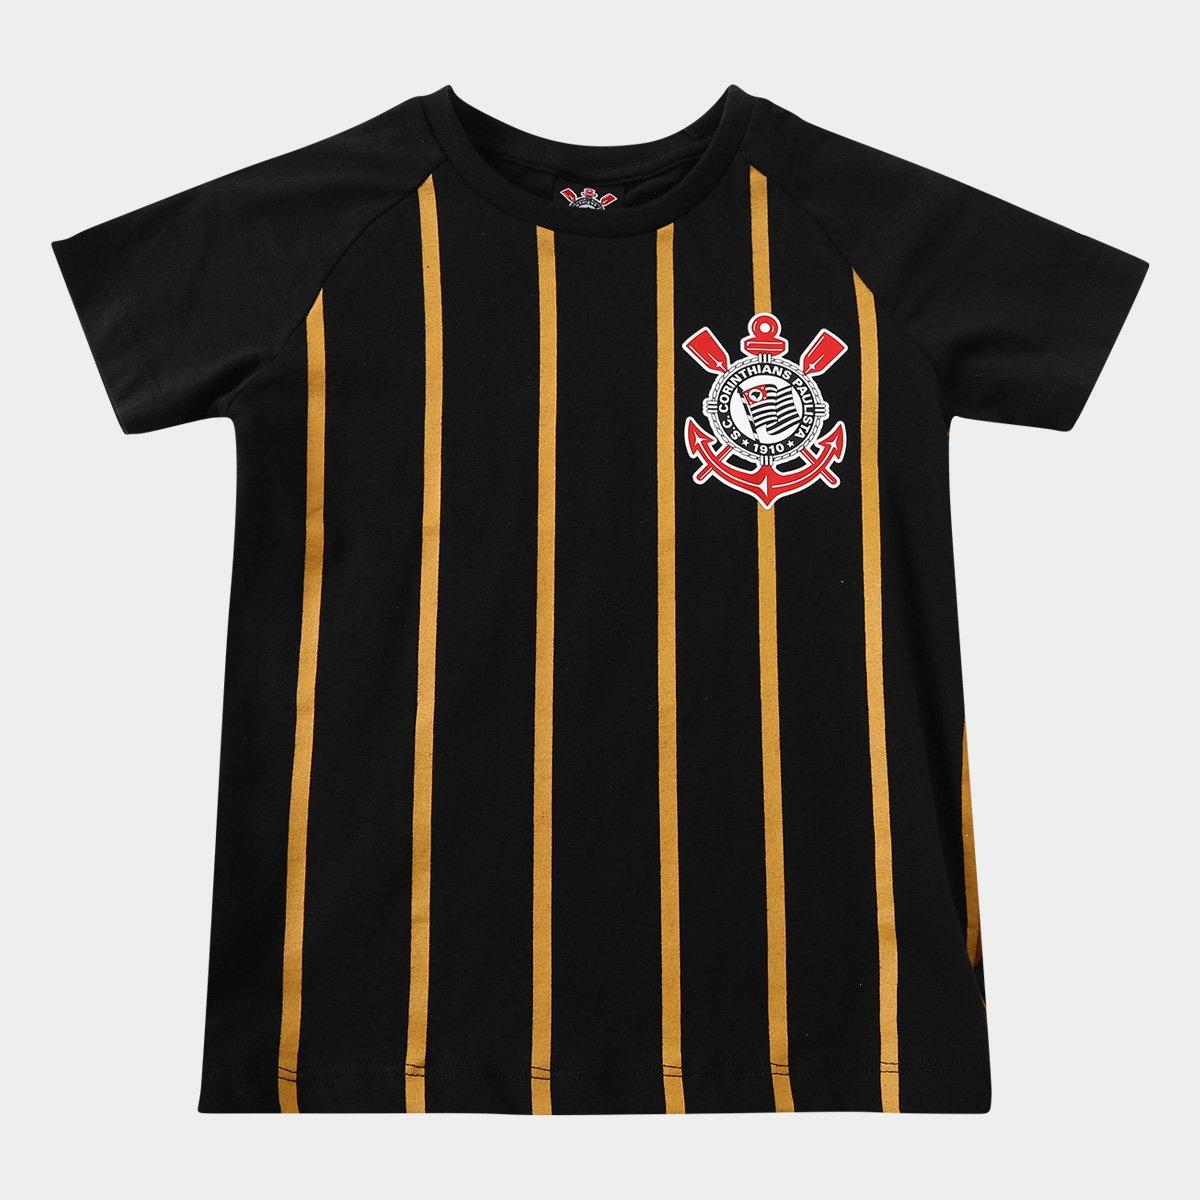 bd604b7afc Camiseta Corinthians Infantil Gold - Preto - Compre Agora